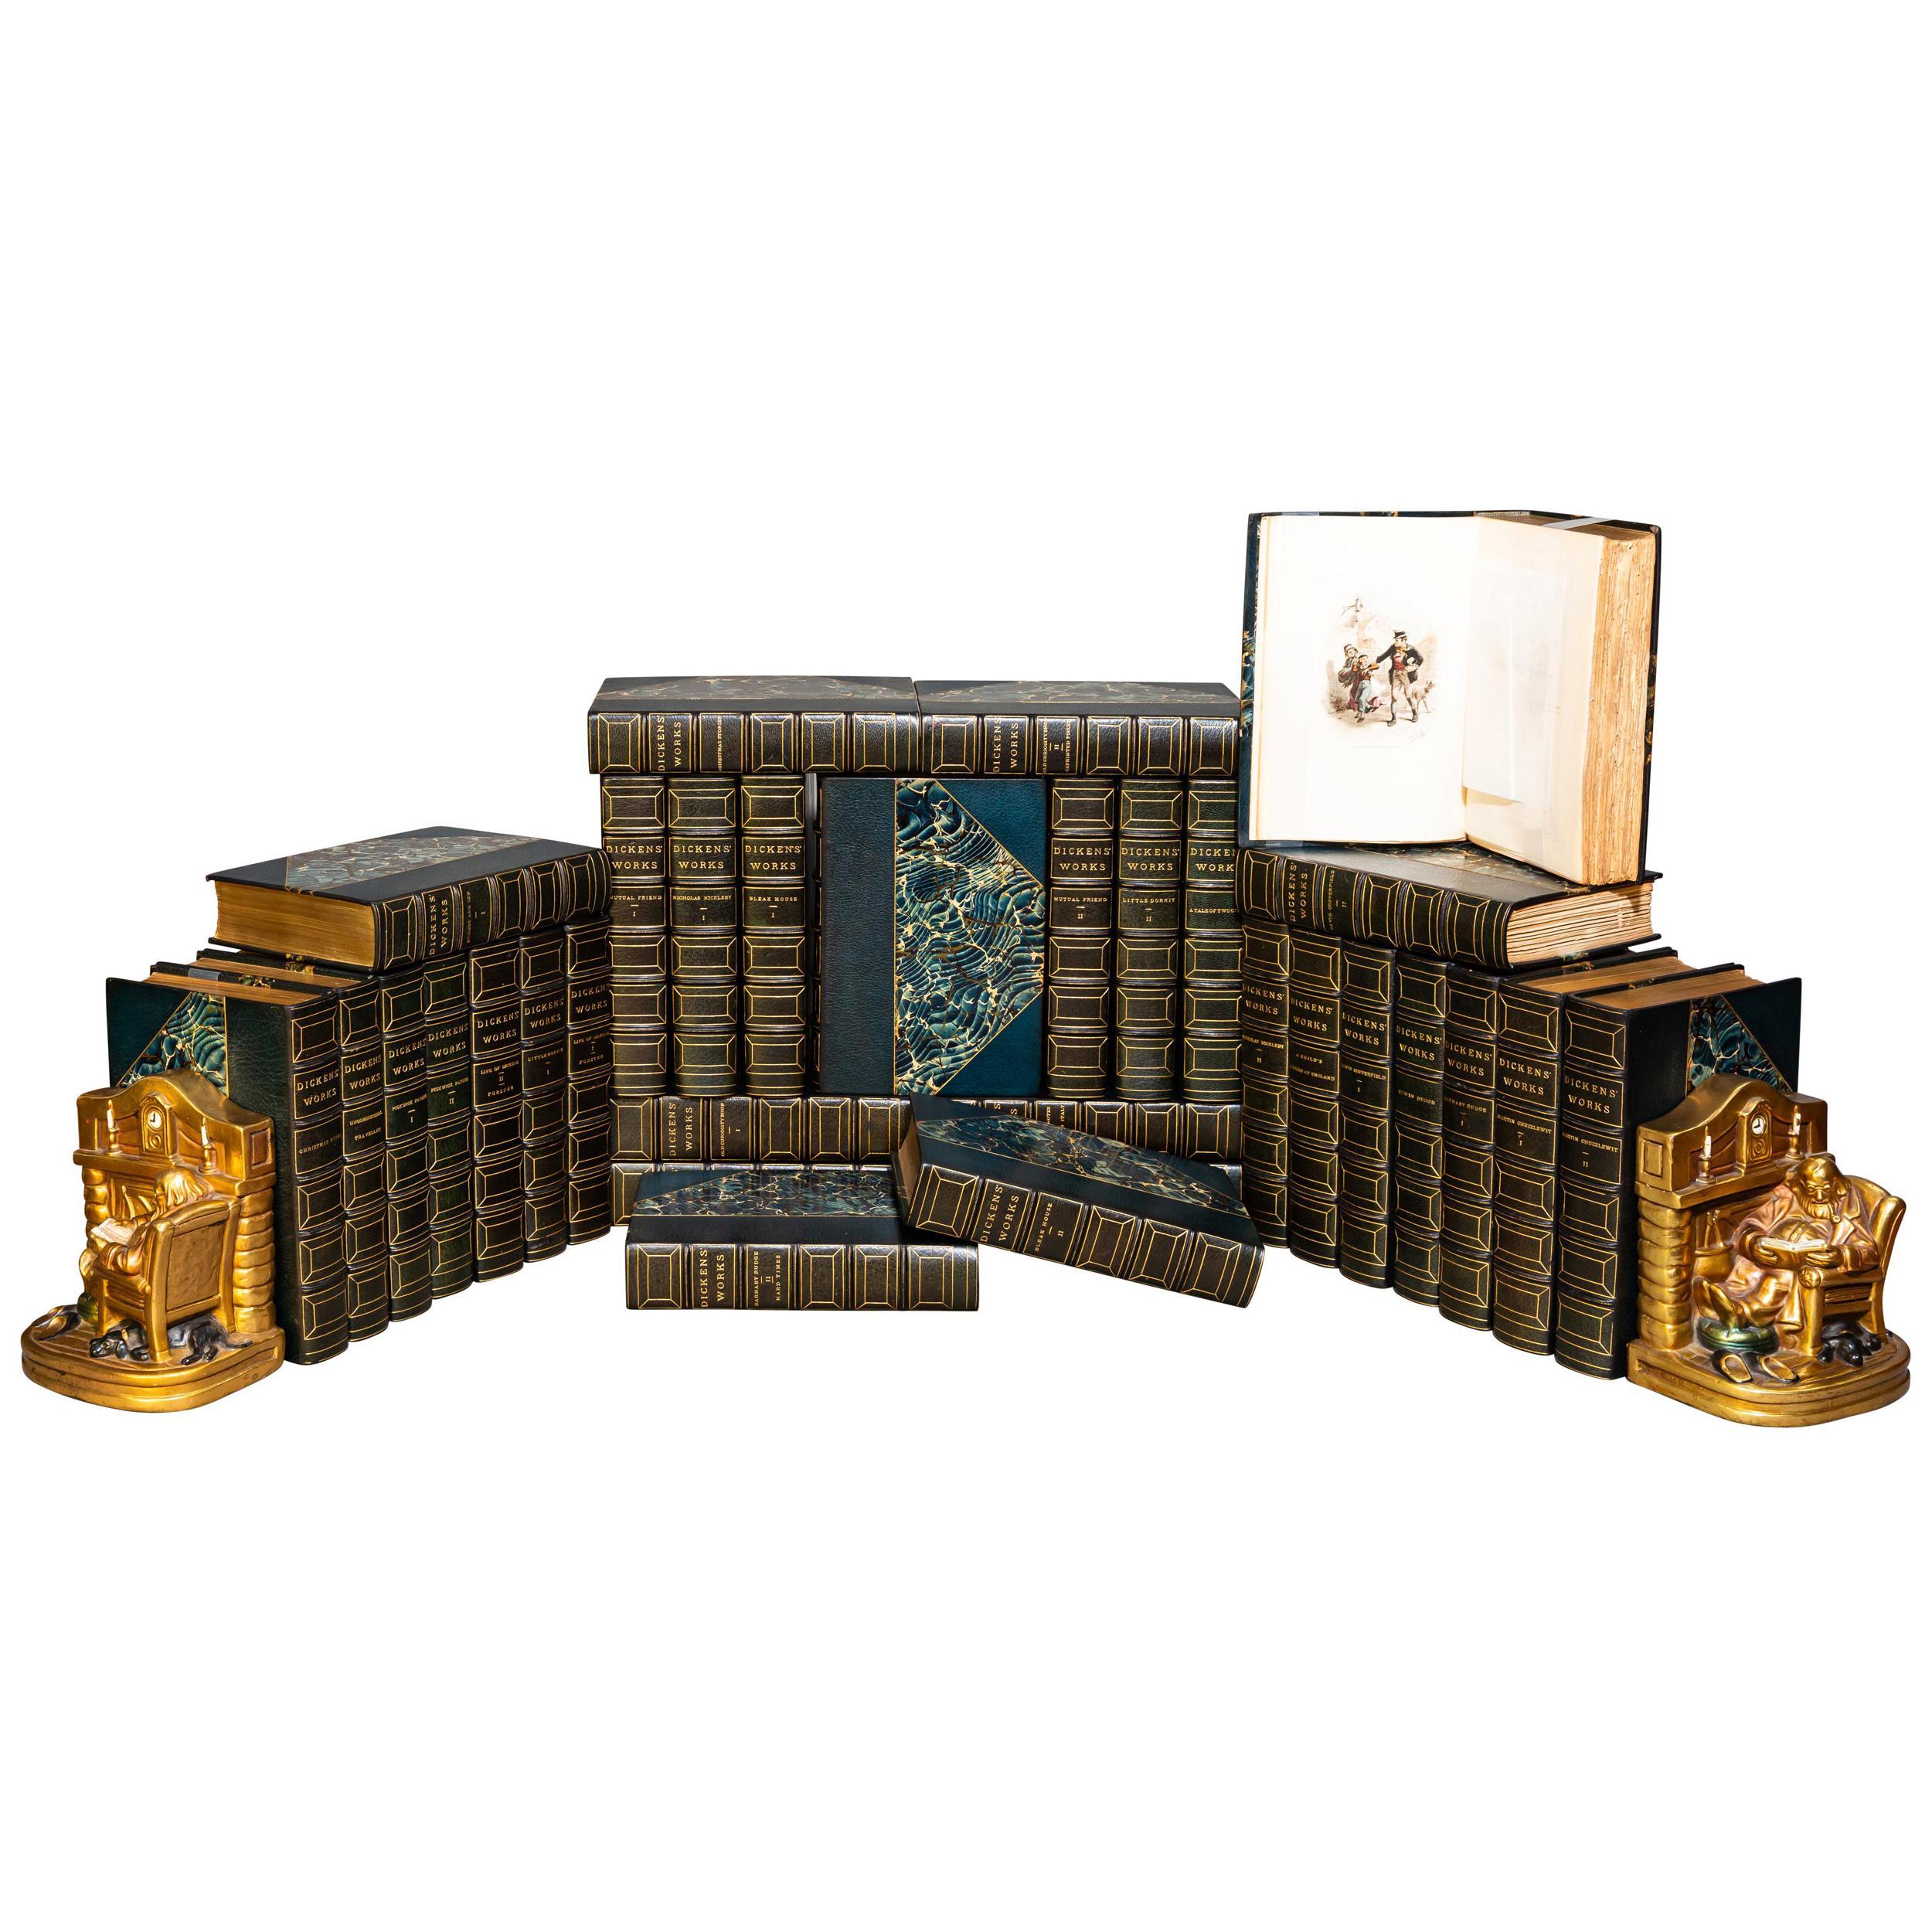 'Book Set' 32 Volumes, Charles Dickens, Complete Works